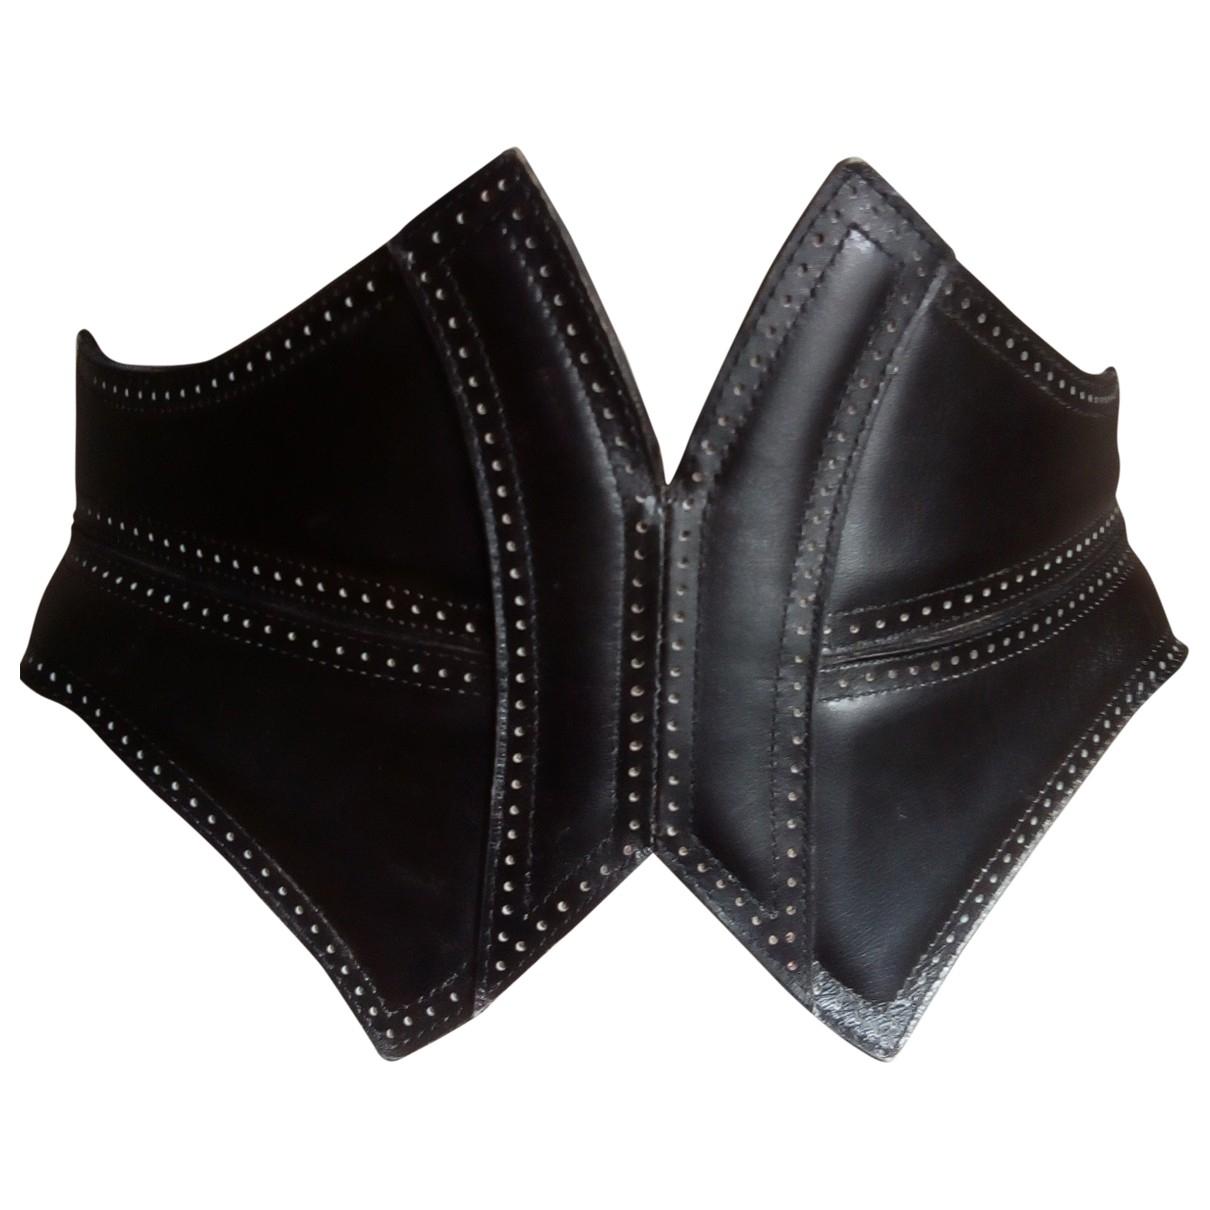 Alaïa \N Black Leather belt for Women XS International